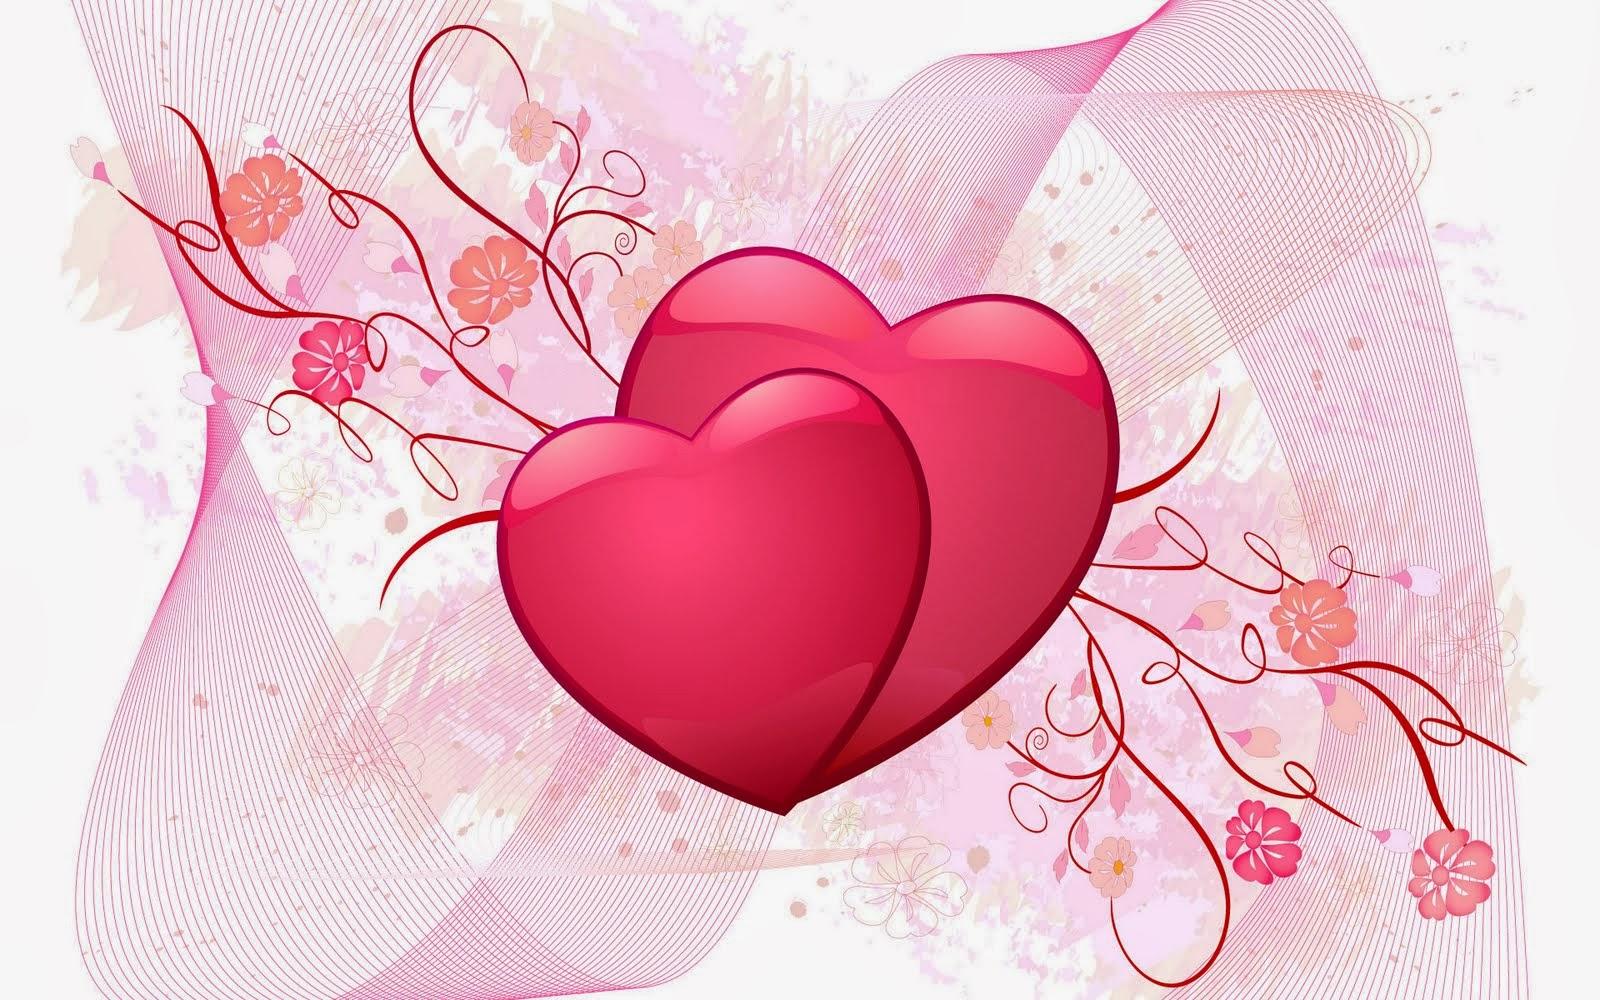 Puisi Cinta Romantis Lifestyle Wanita